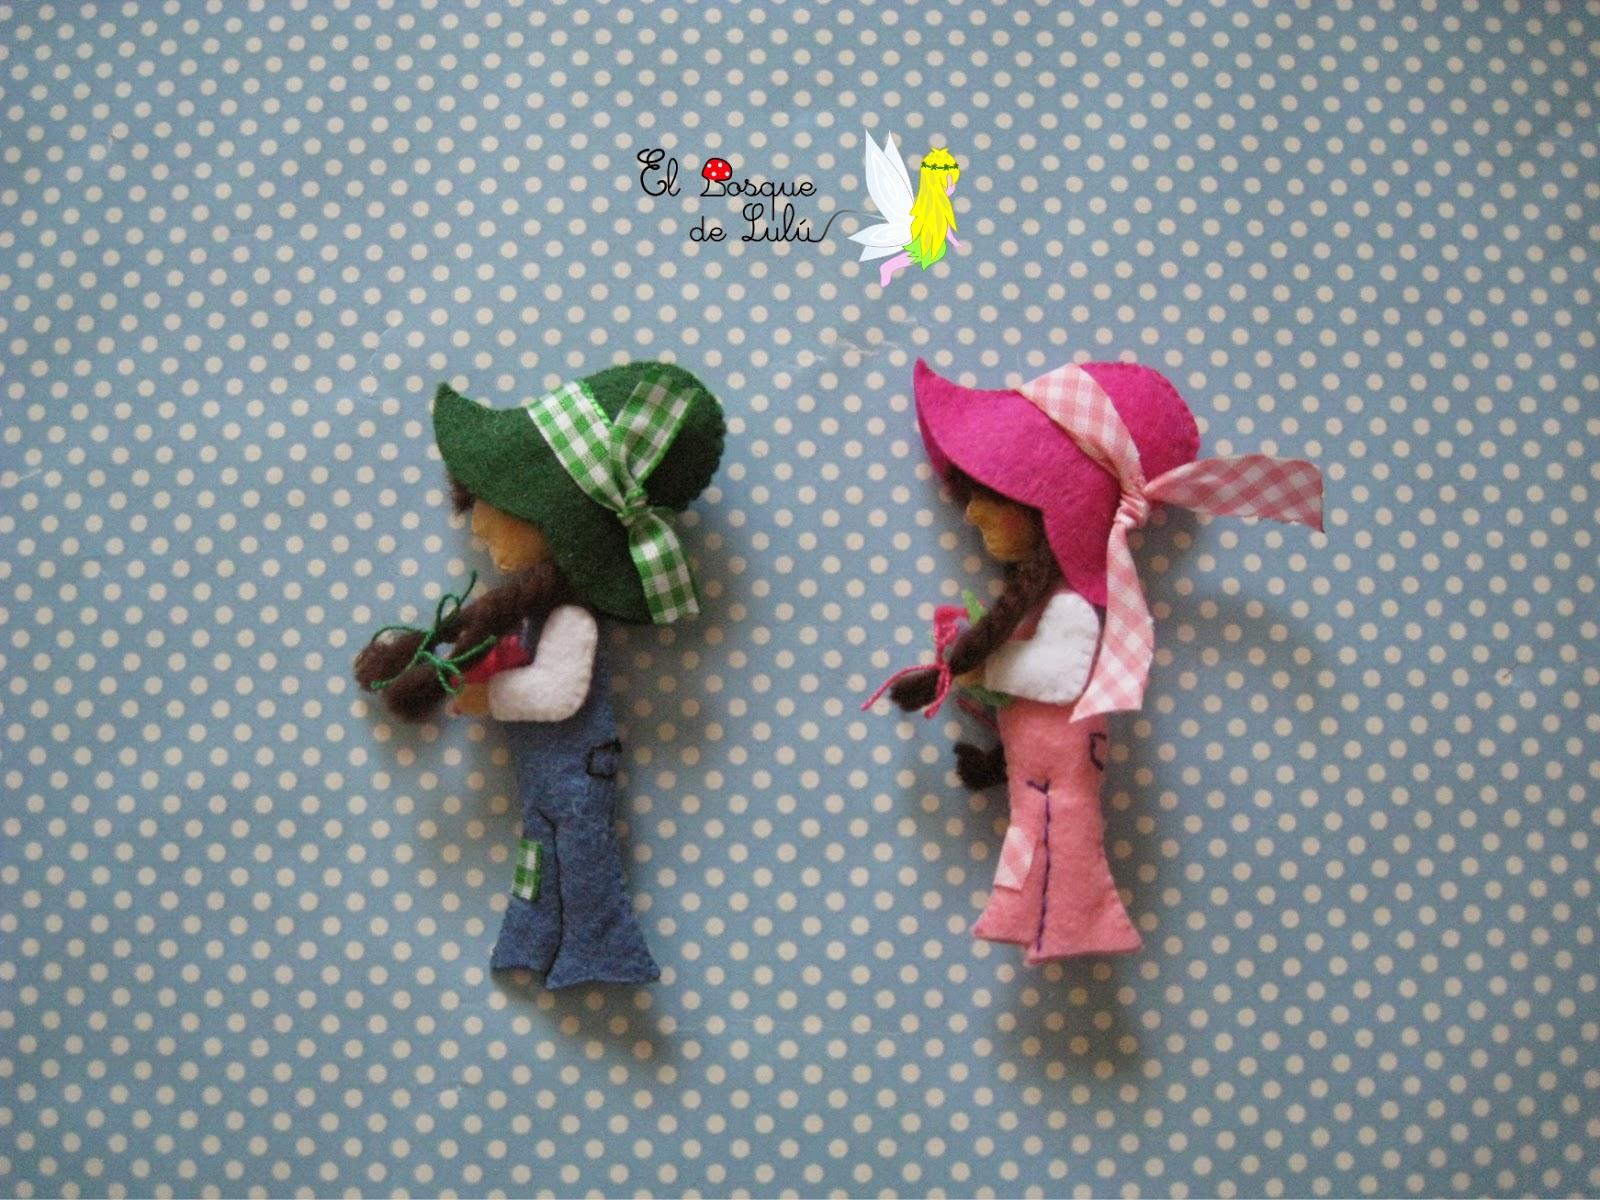 broche-fieltro-muñeca-Sara-Kay-subasta-solidaria-AECC-rosa